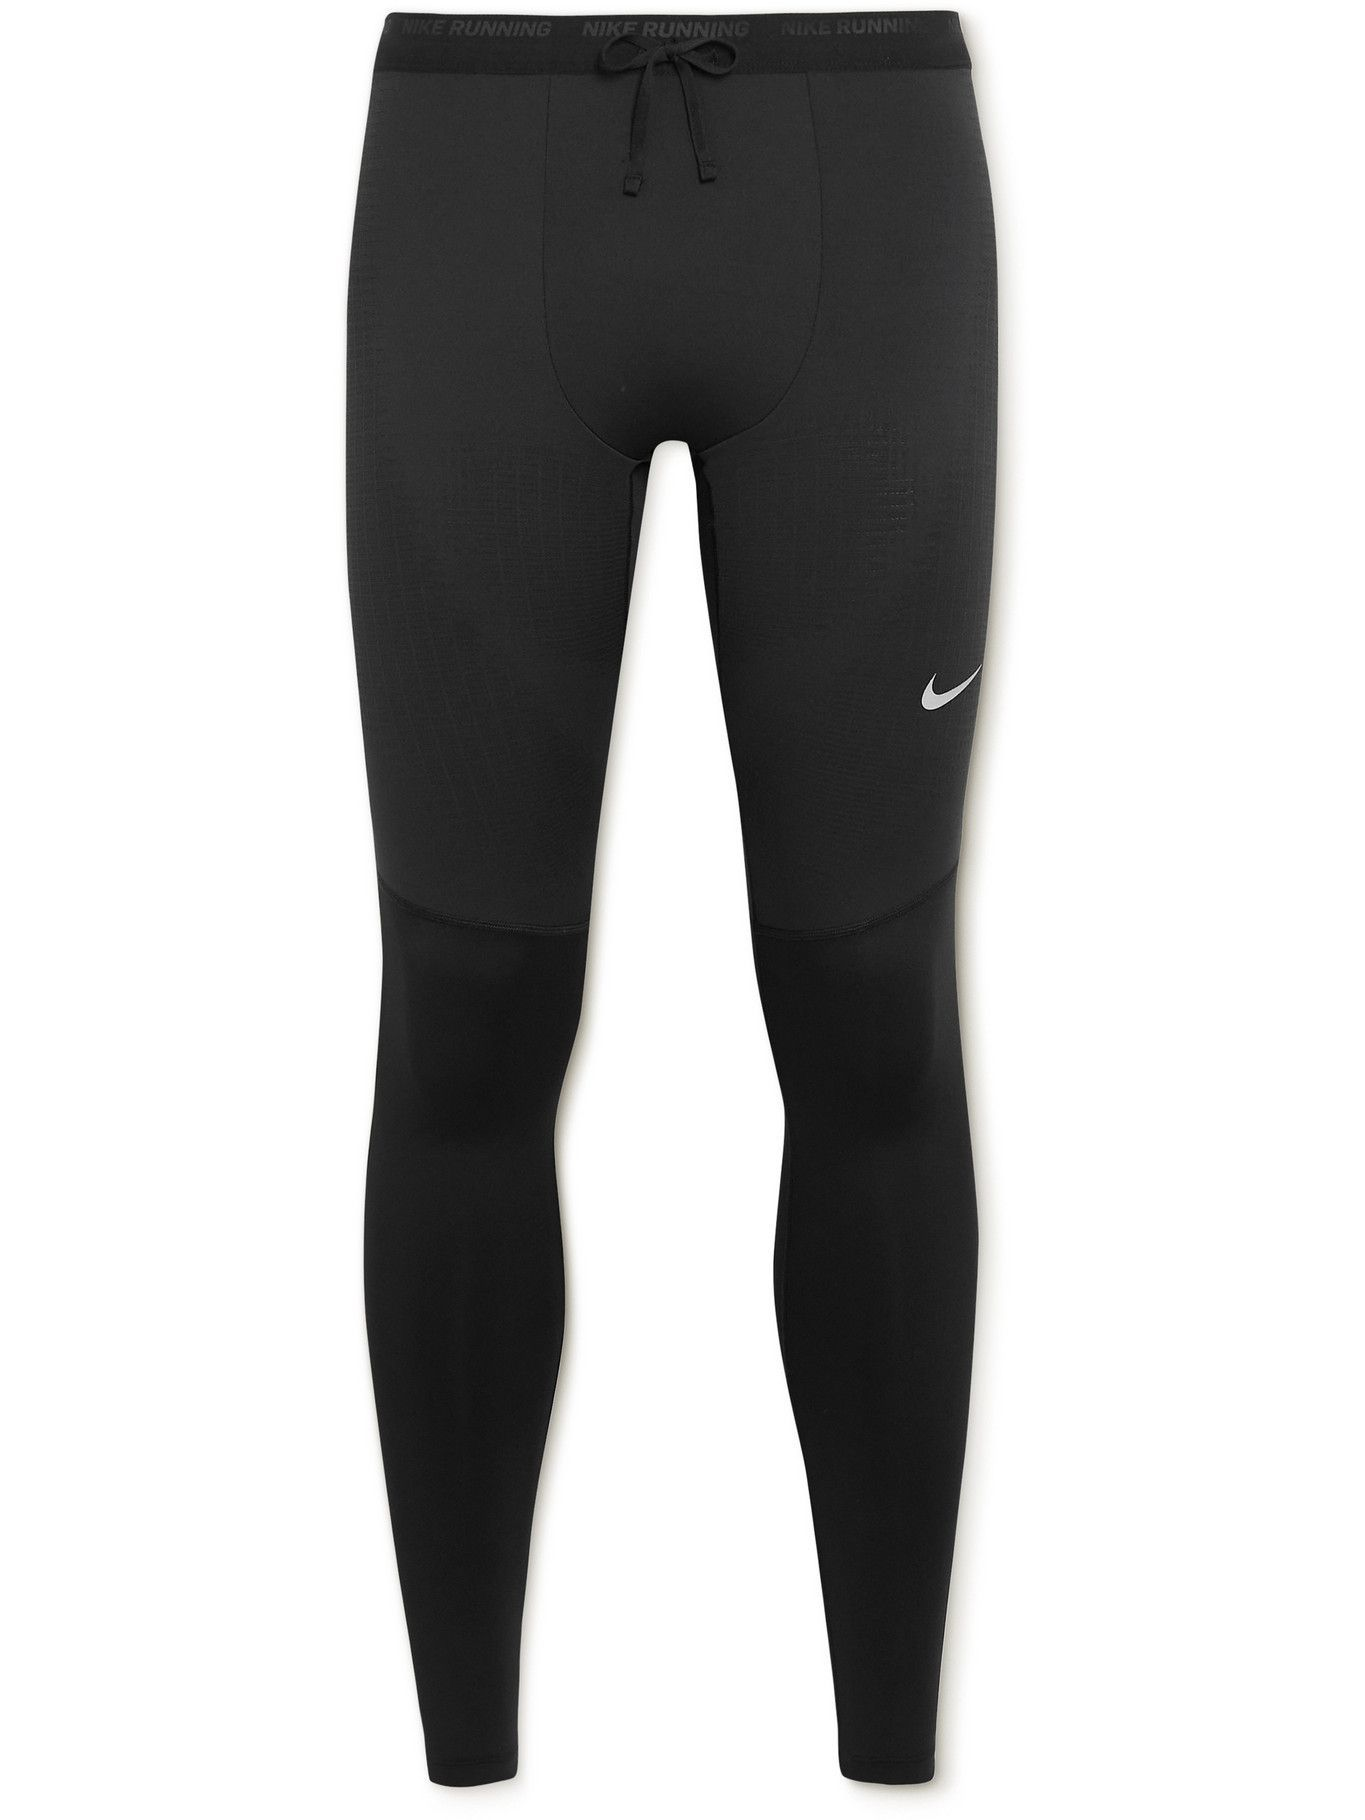 NIKE RUNNING - Phenom Elite Stretch-Jersey Tights - Black